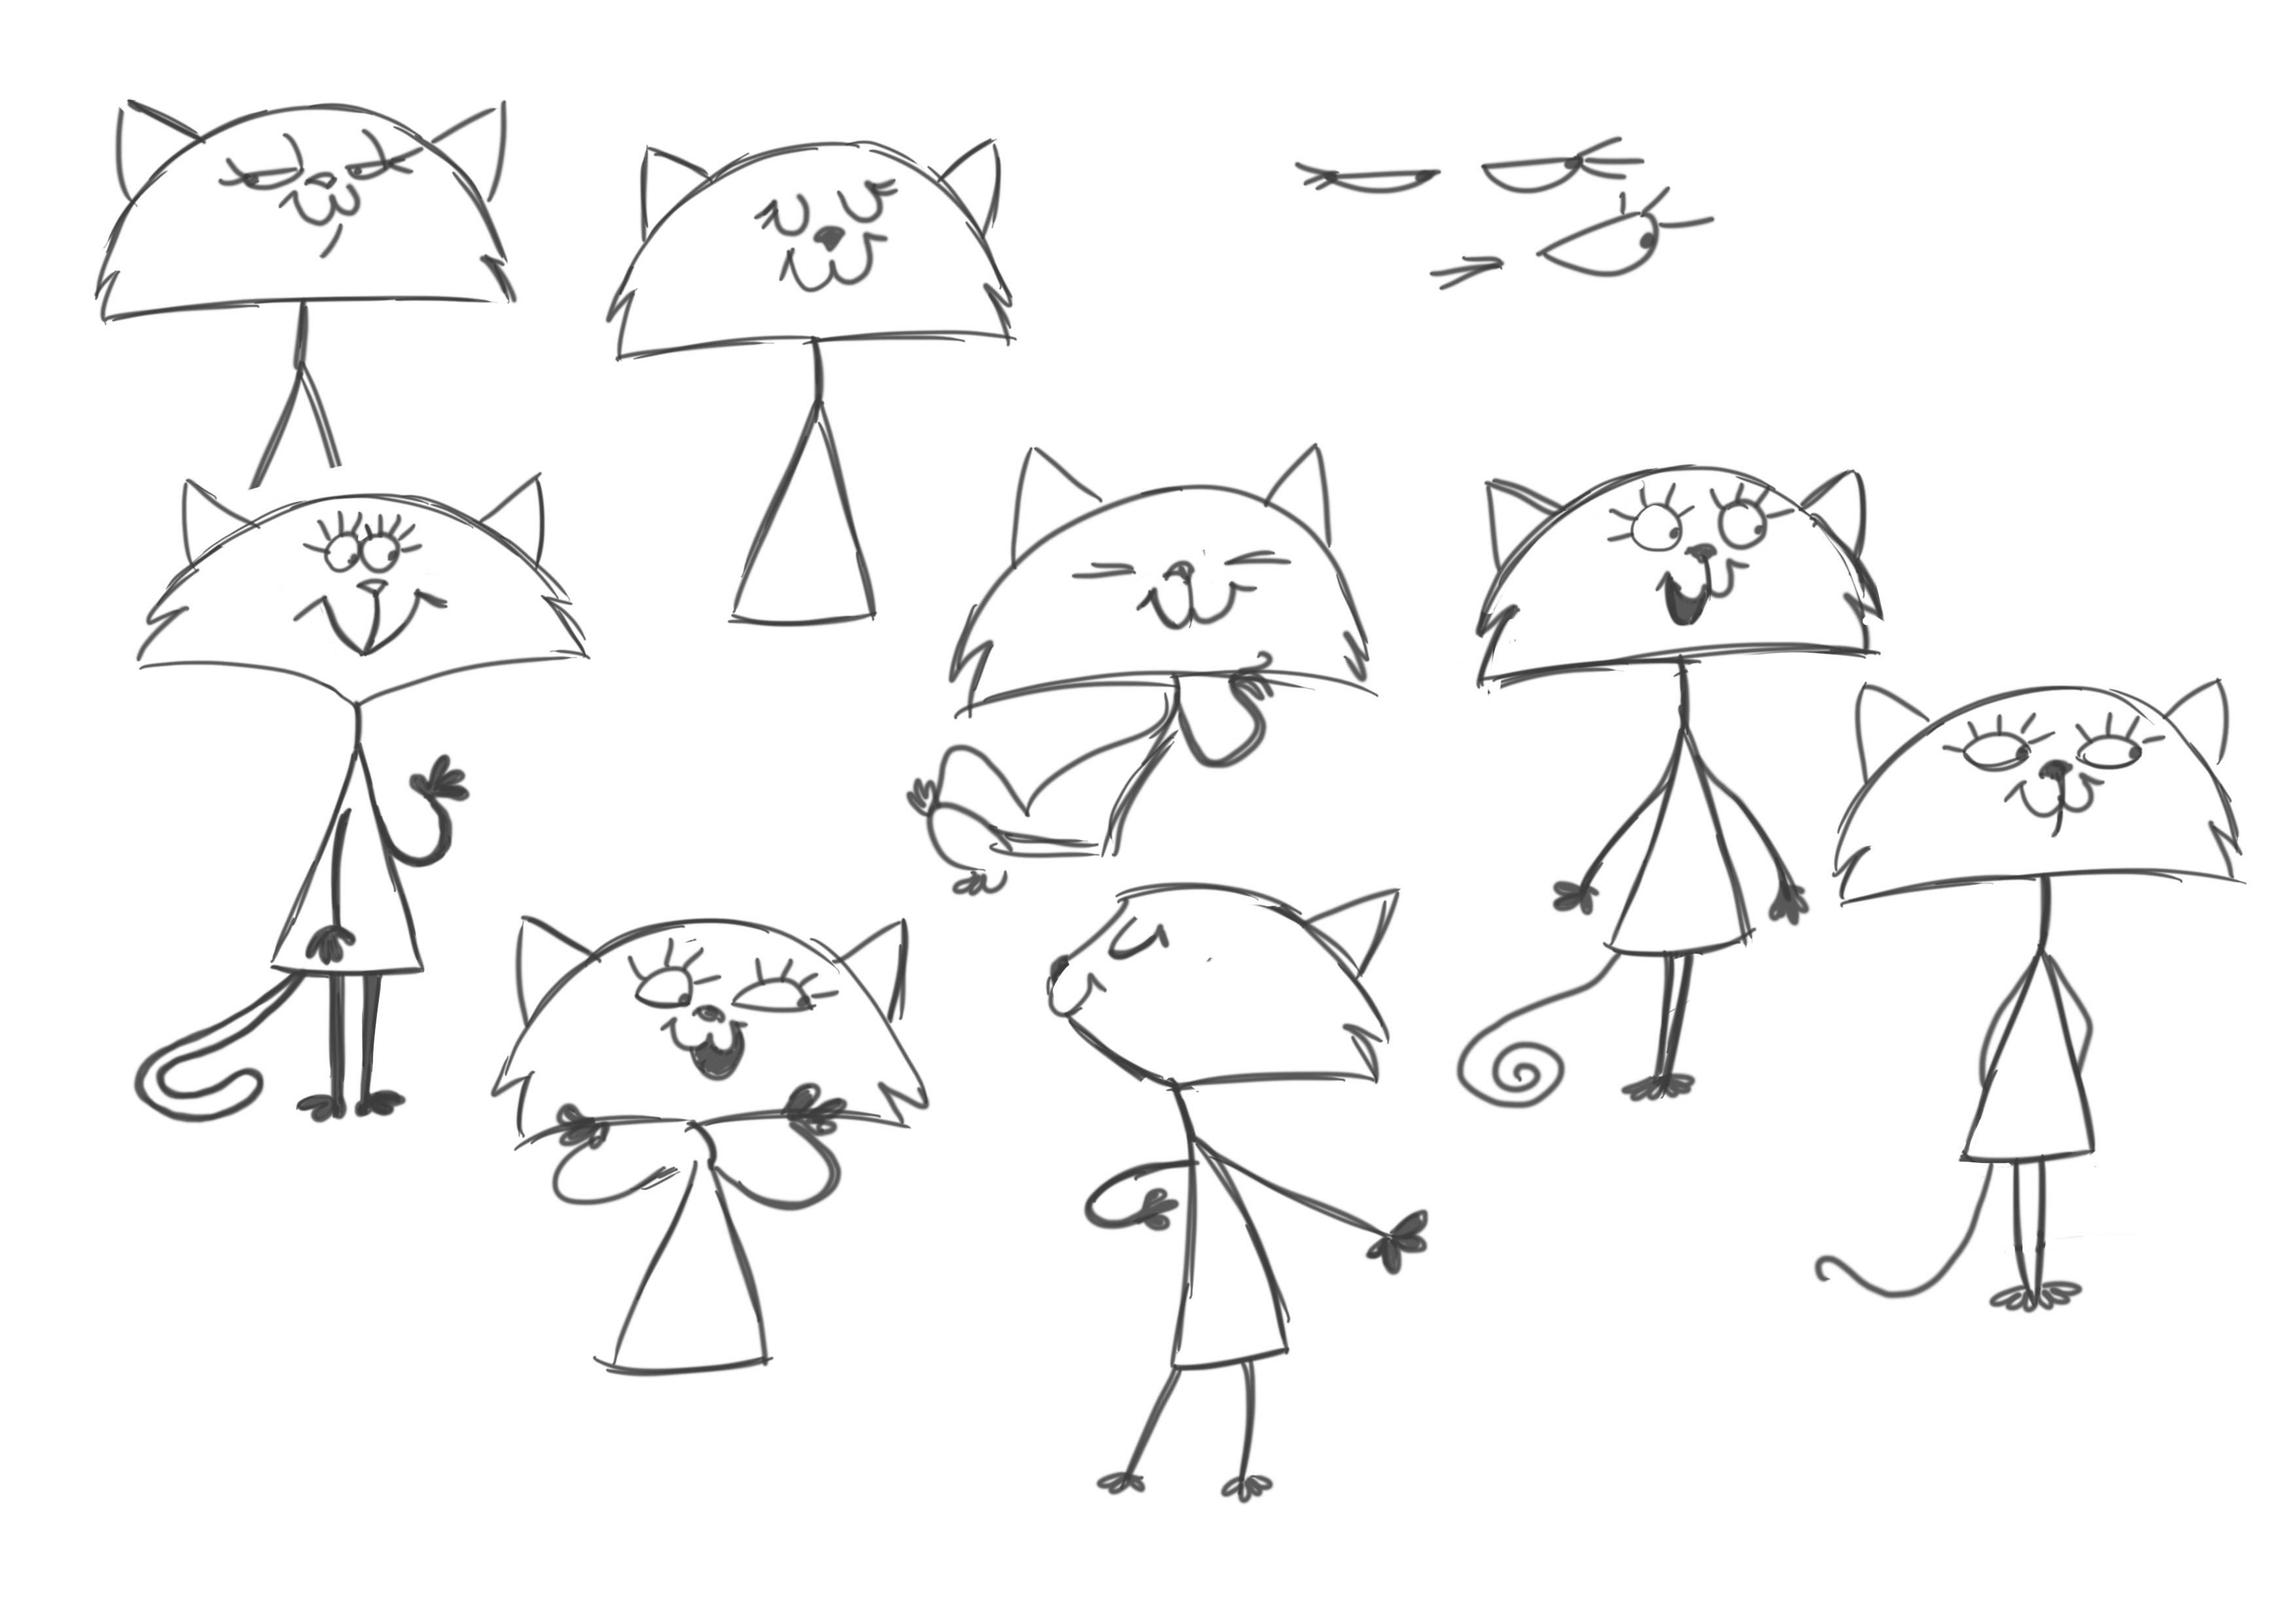 Frenemy sketch